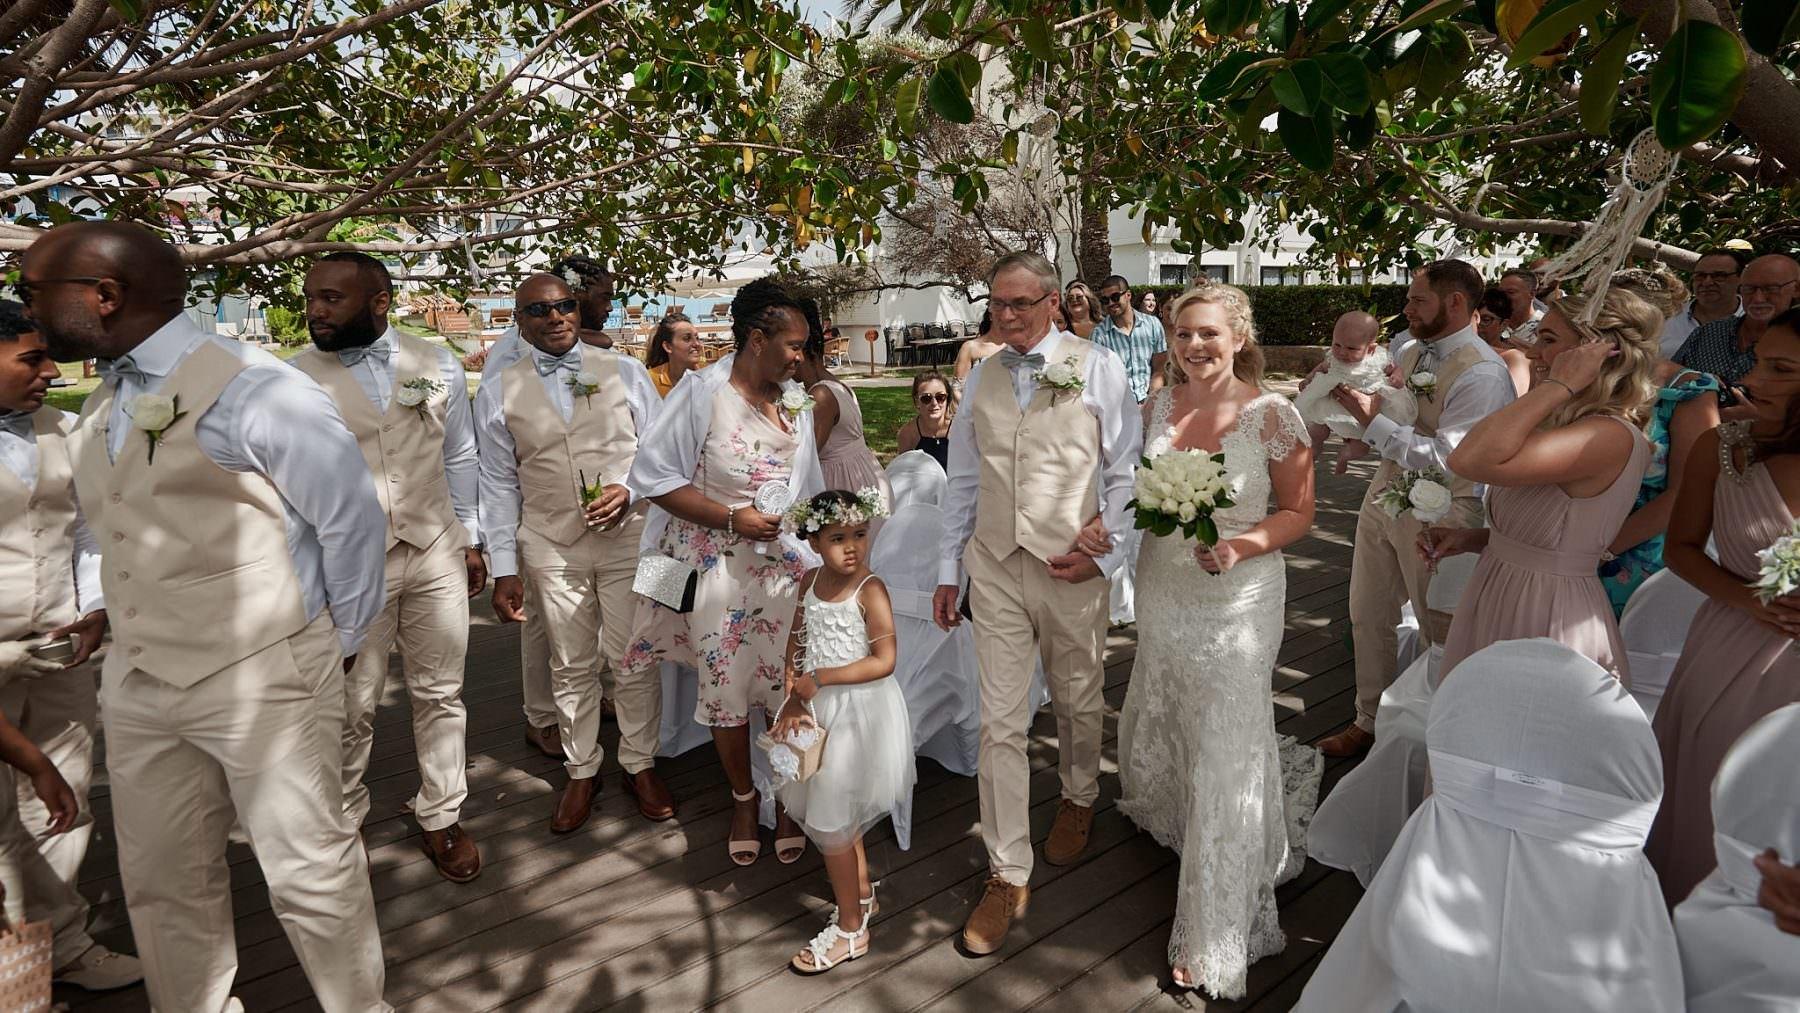 Wedding photograpy in Cyprus by Richard King  http://www.thecyprusweddingphotographer.com